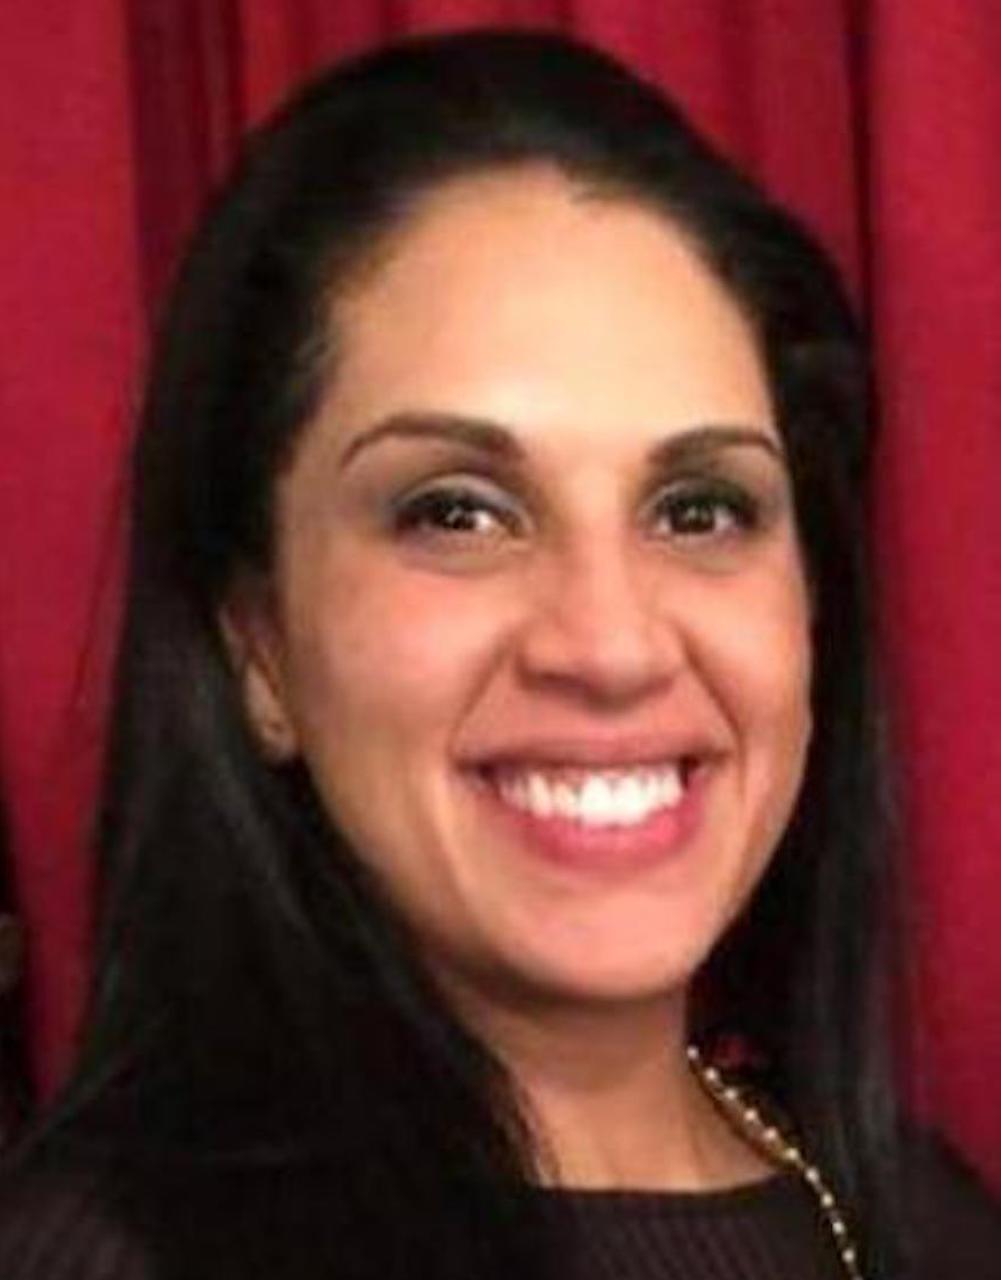 Kelin Mirei Pacheco White es asesinada balazos por su esposo